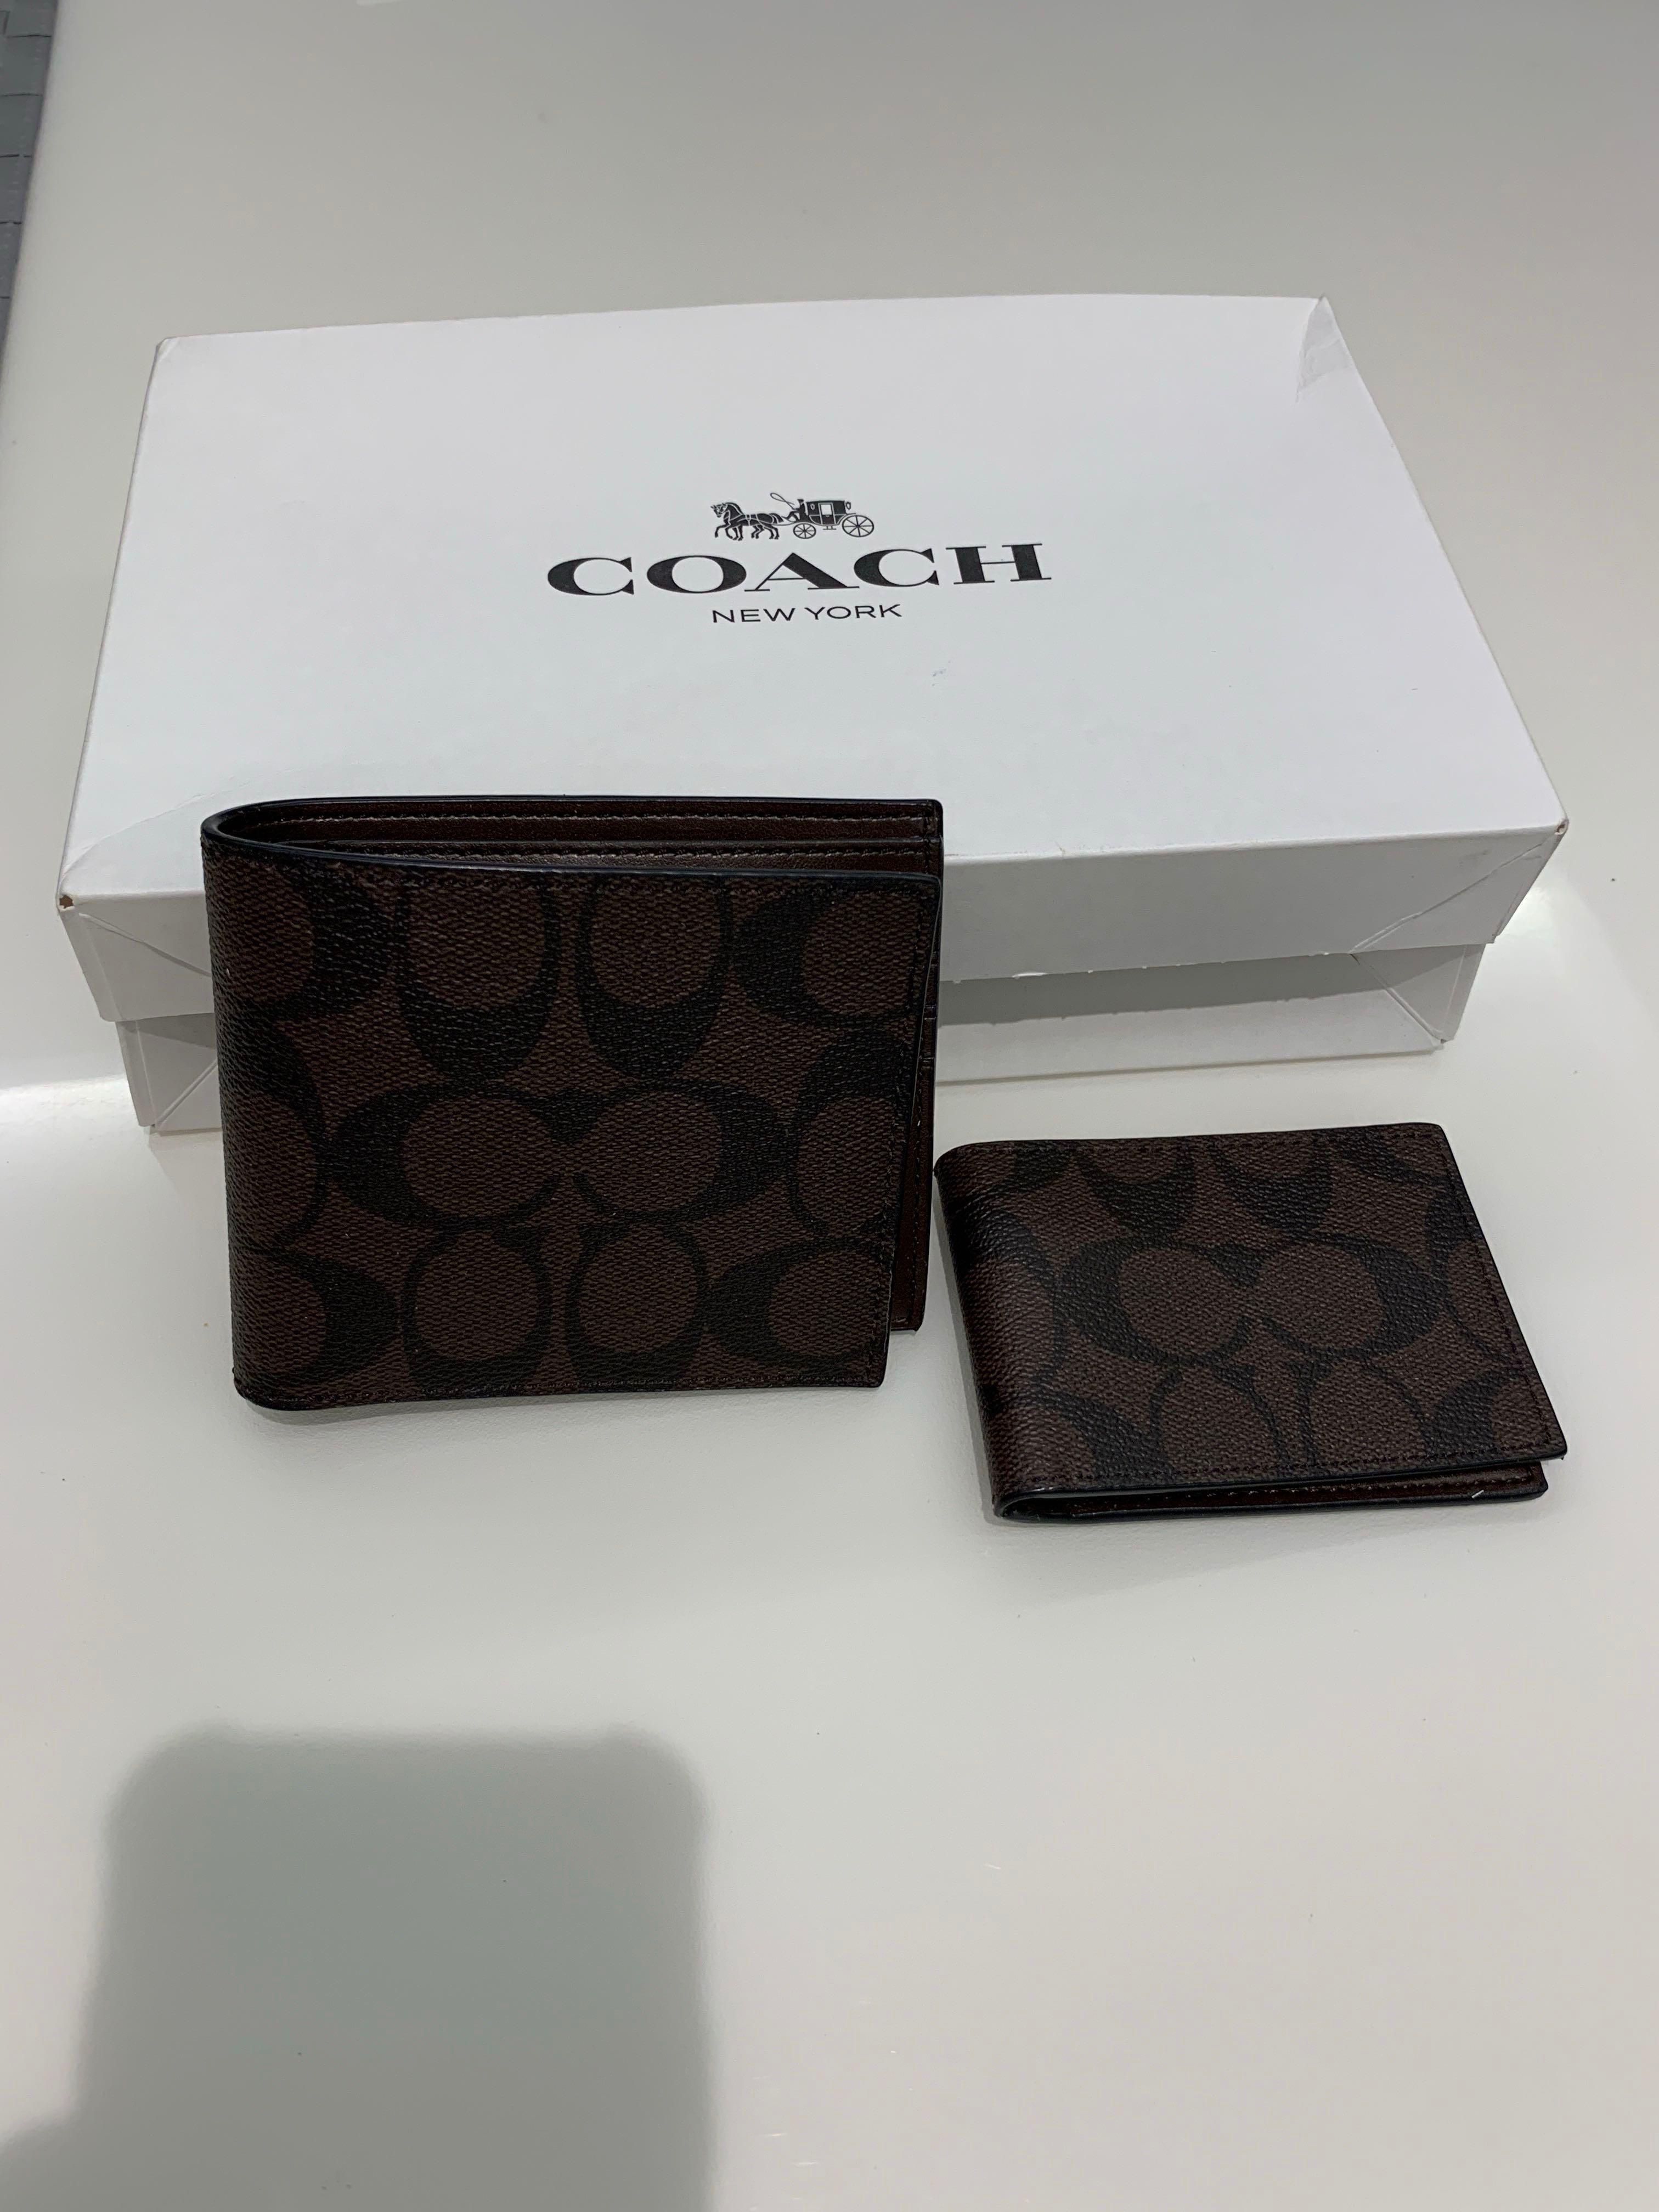 0905ff80b0 Coach Men's Wallet, Men's Fashion, Bags & Wallets, Wallets on Carousell